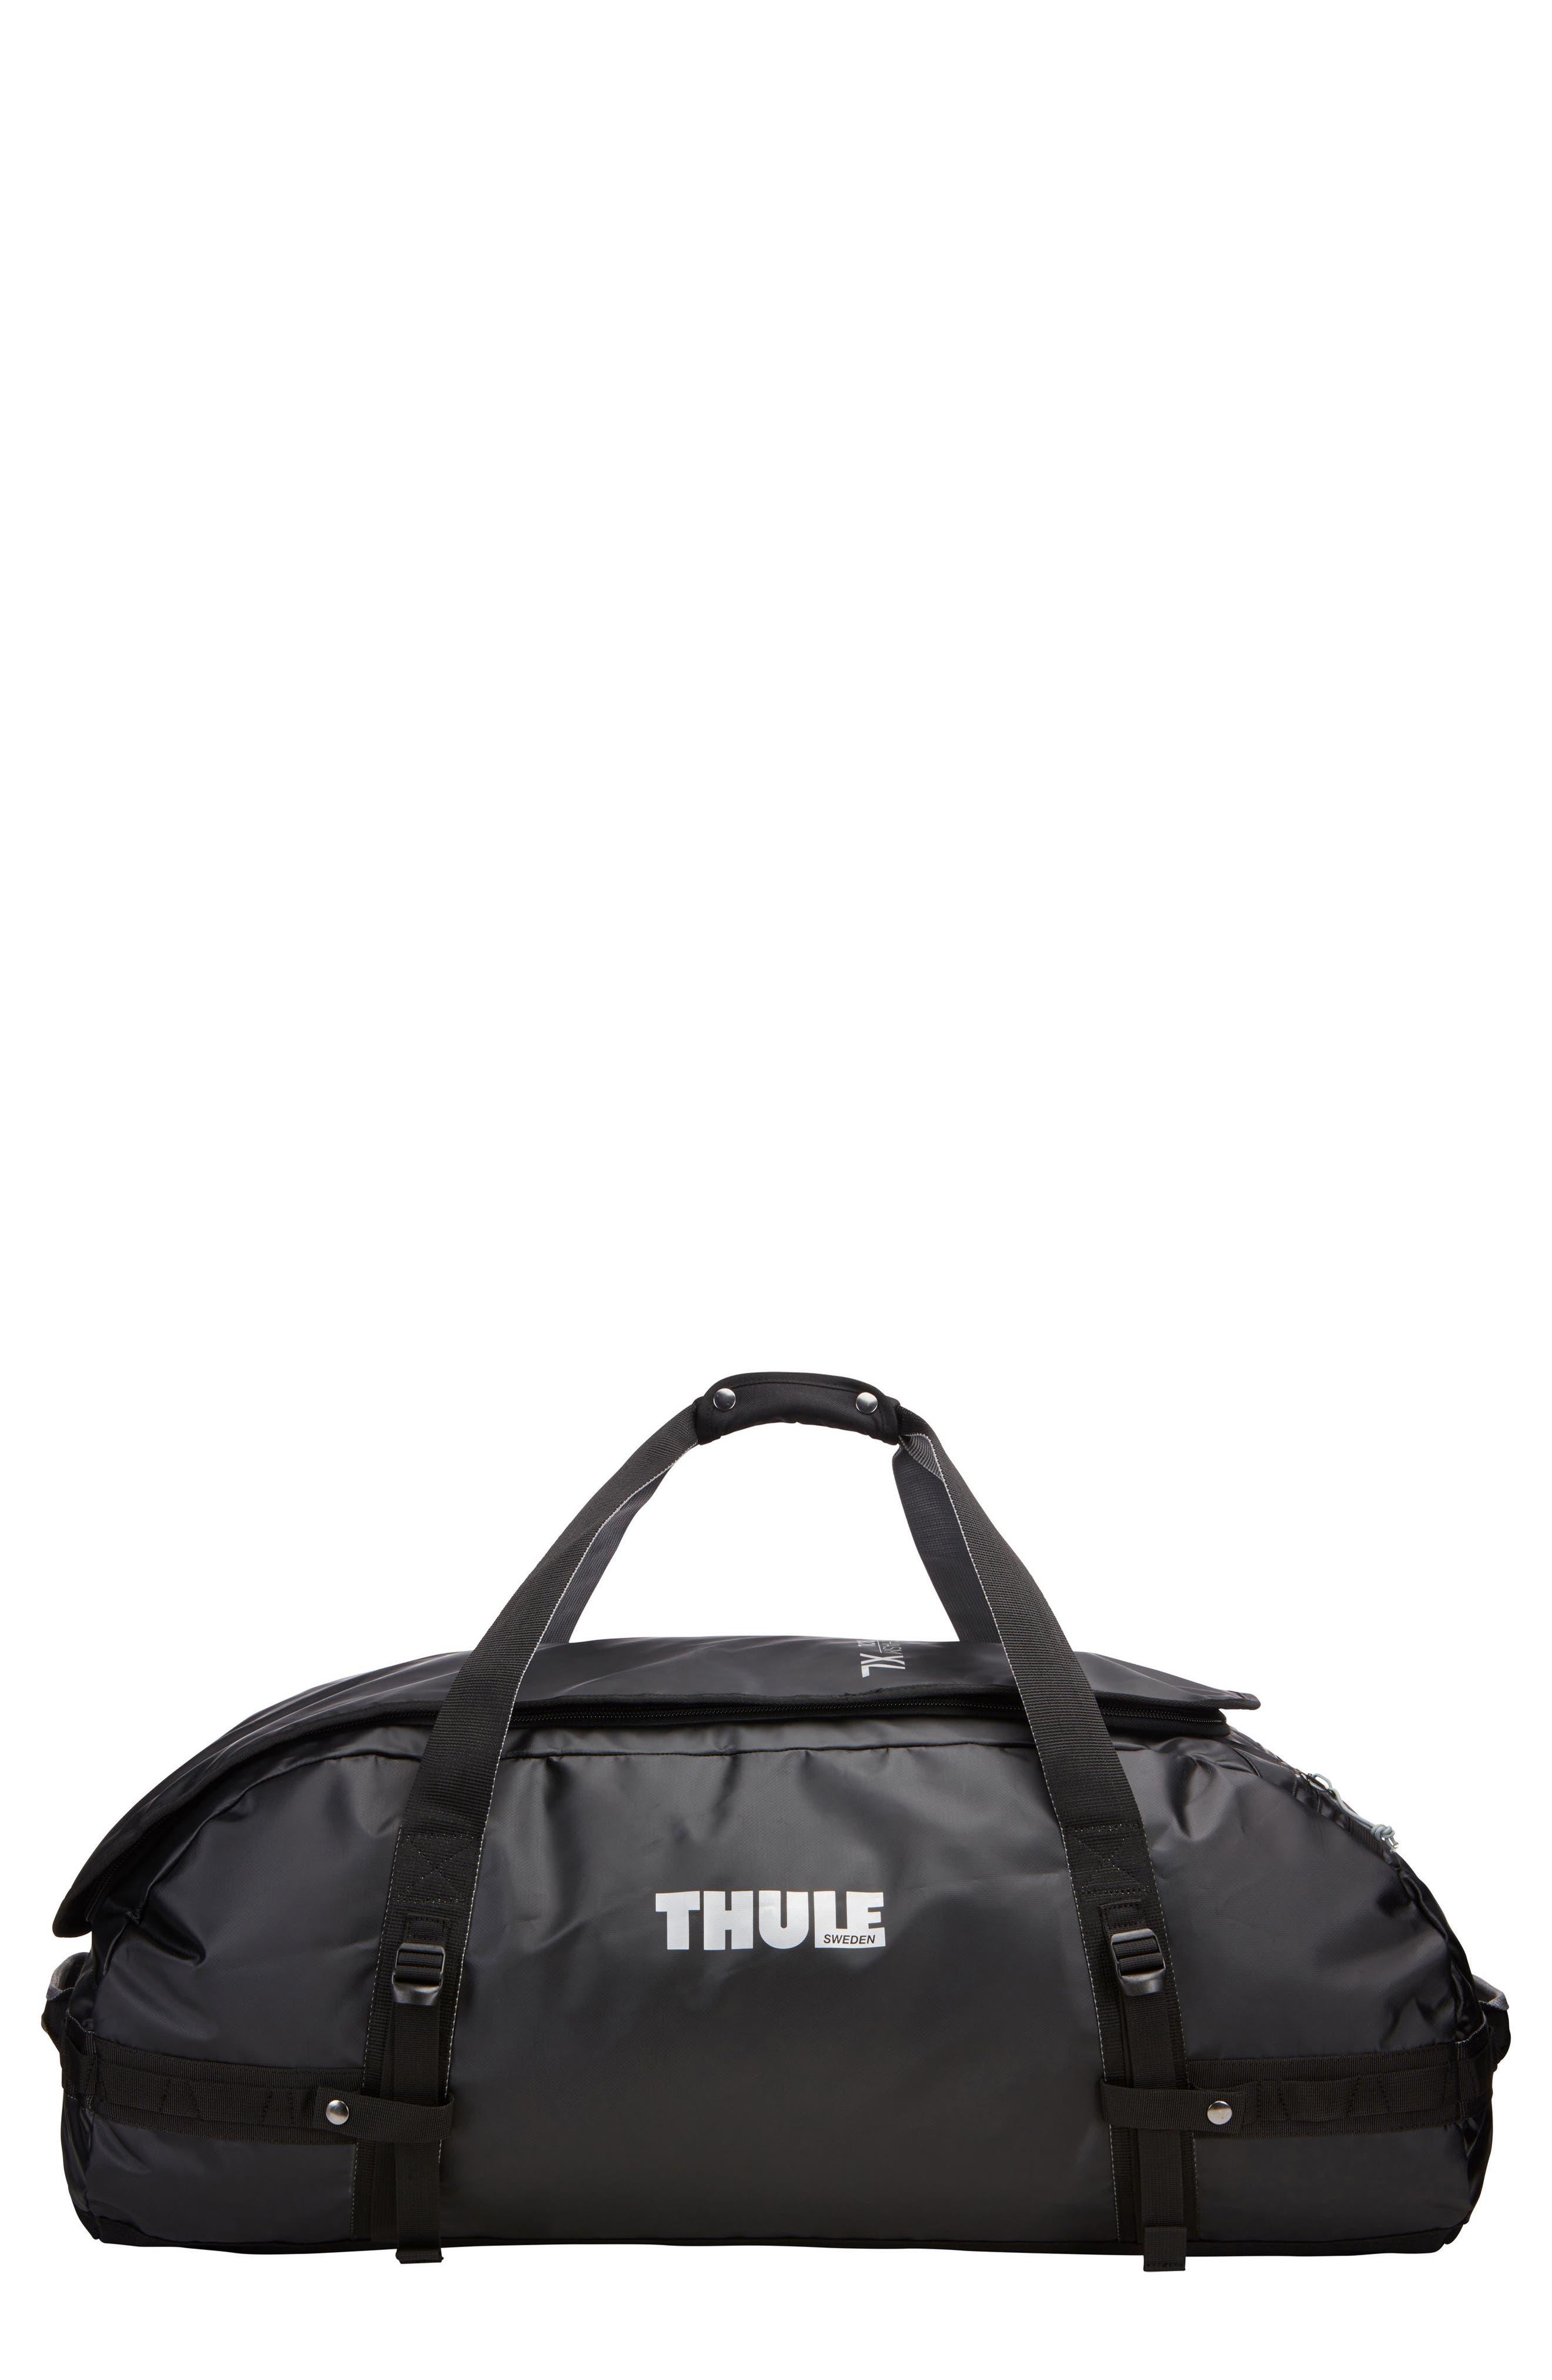 Chasm 130-Liter Convertible Duffel Bag,                             Main thumbnail 1, color,                             BLACK